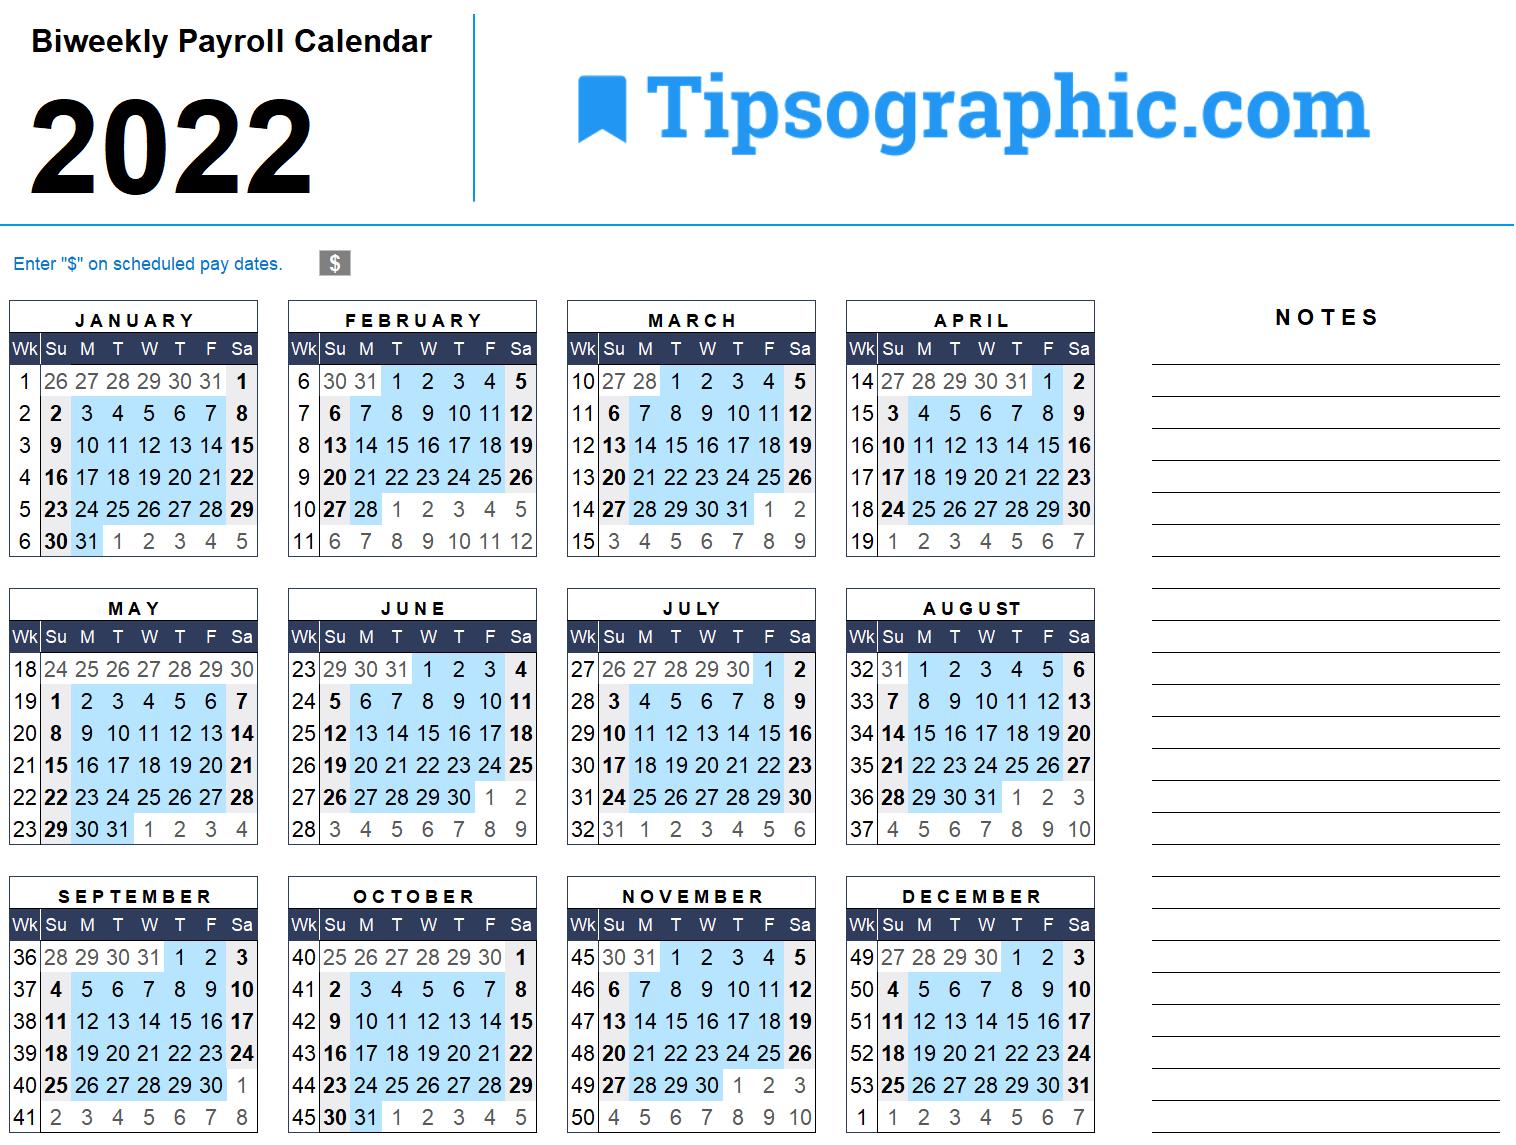 Download The 2022 Facebook Marketing Calendar (With U.s-2021Biweekly Payroll Calendar Template